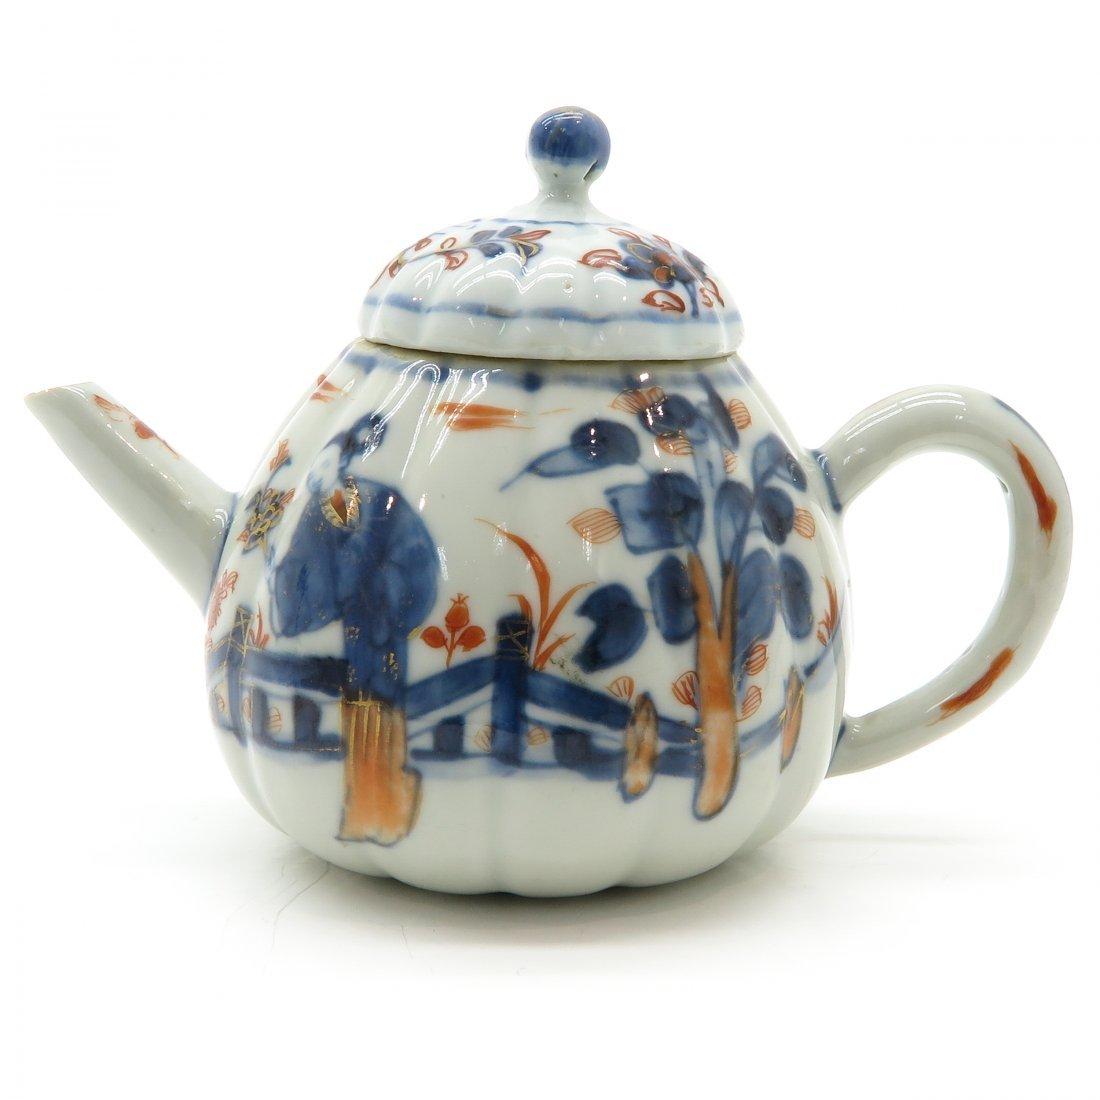 China Porcelain 18th Century Teapot